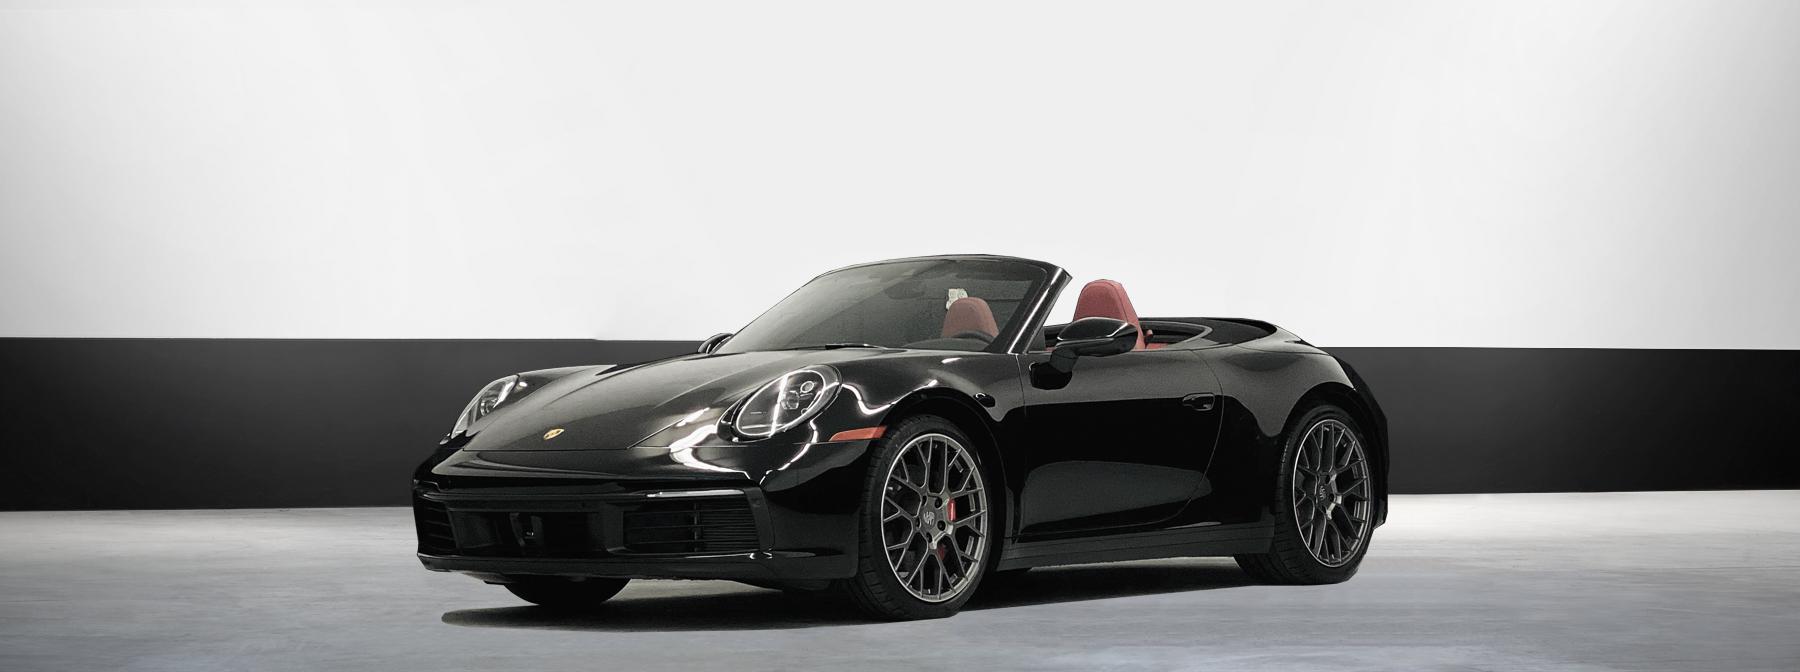 Porsche Convertible Rental in black